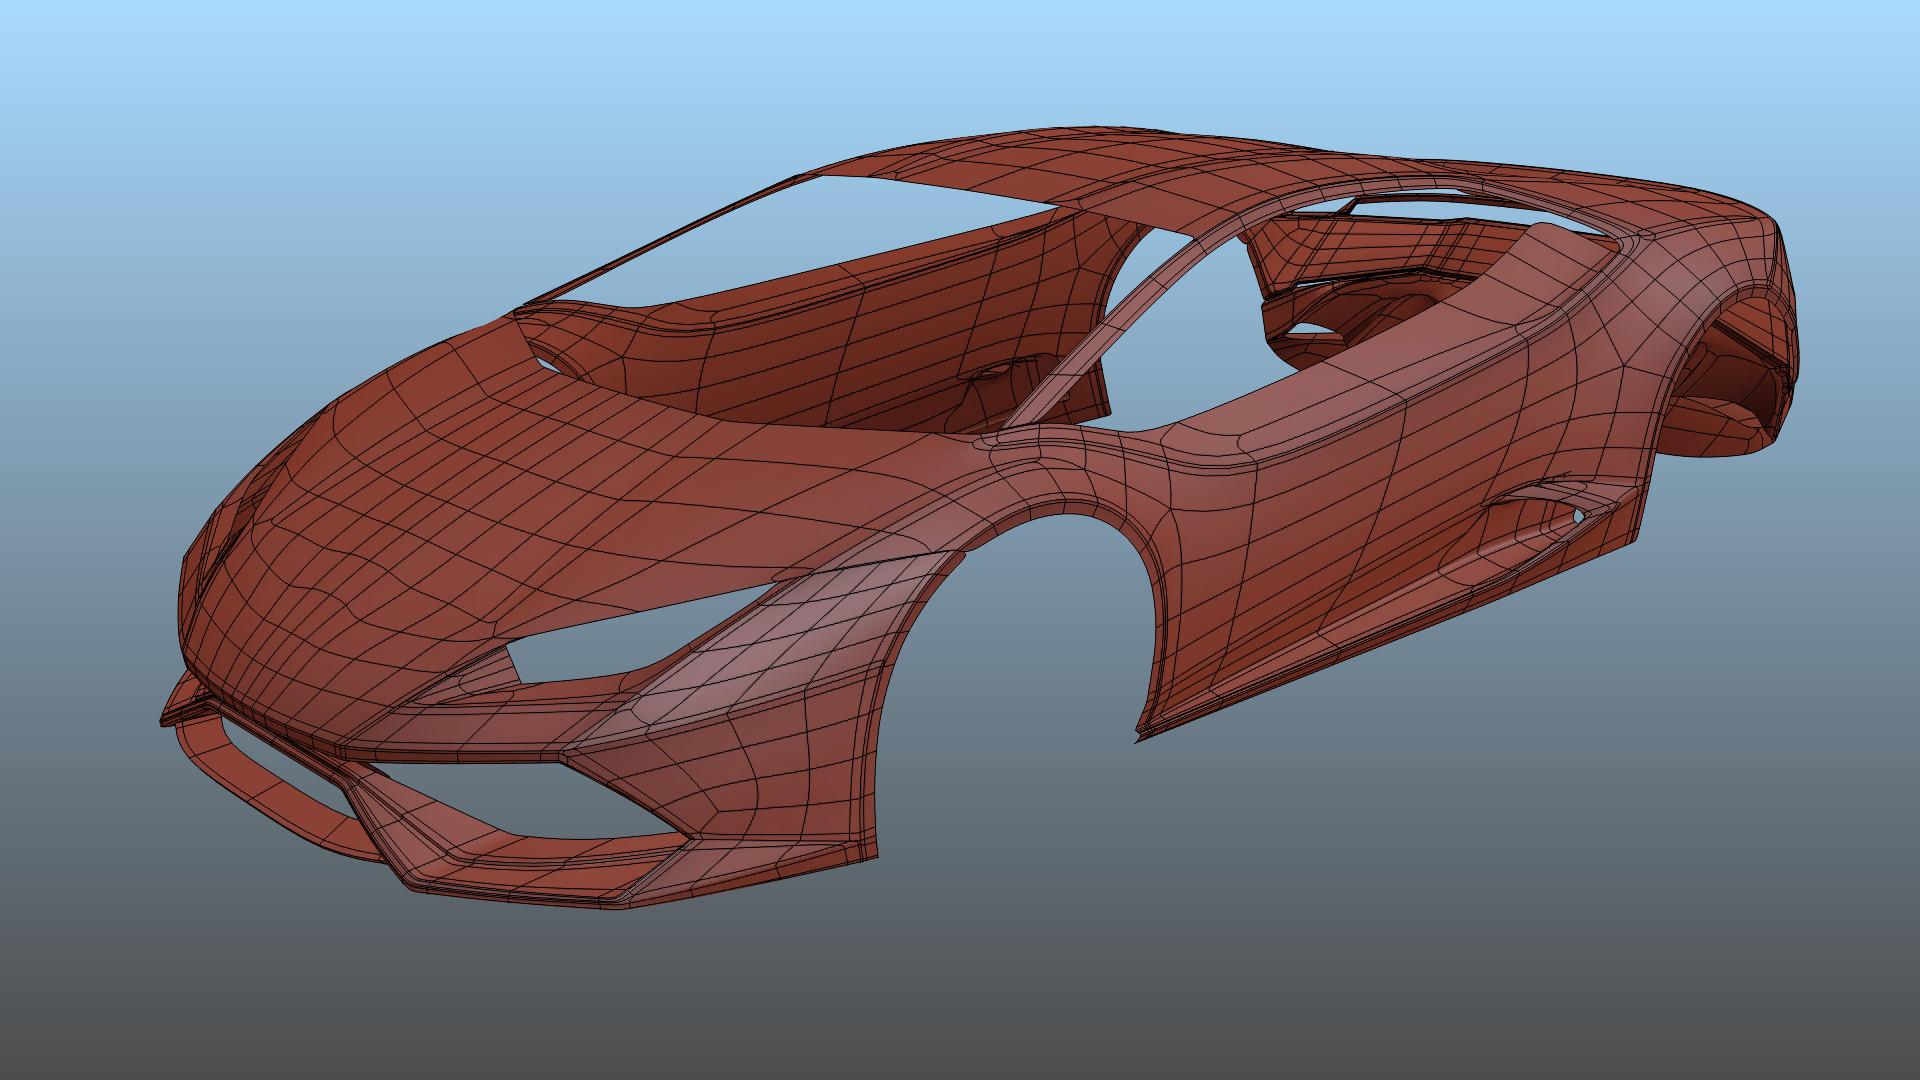 Lamborghini Huracan Works In Progress Blender Artists Community